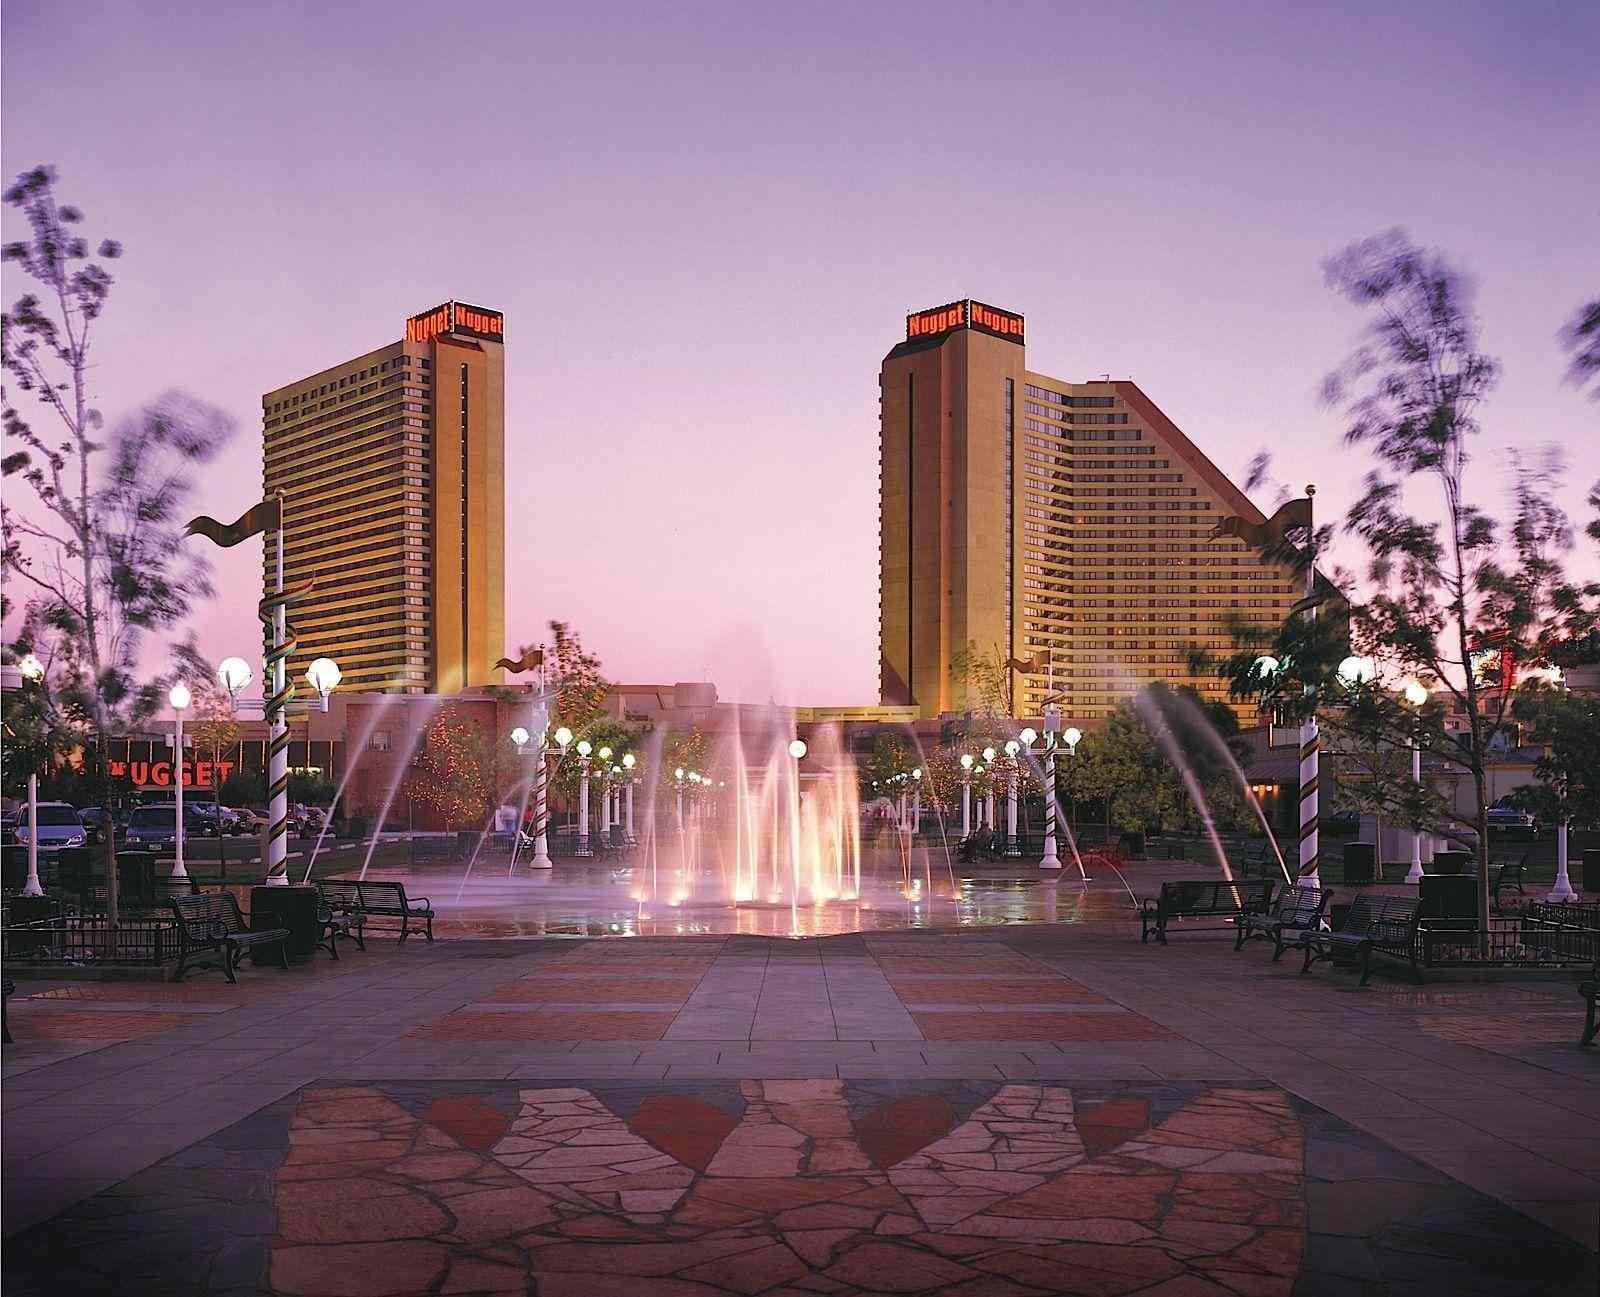 Nugget Casino Resort at twilight